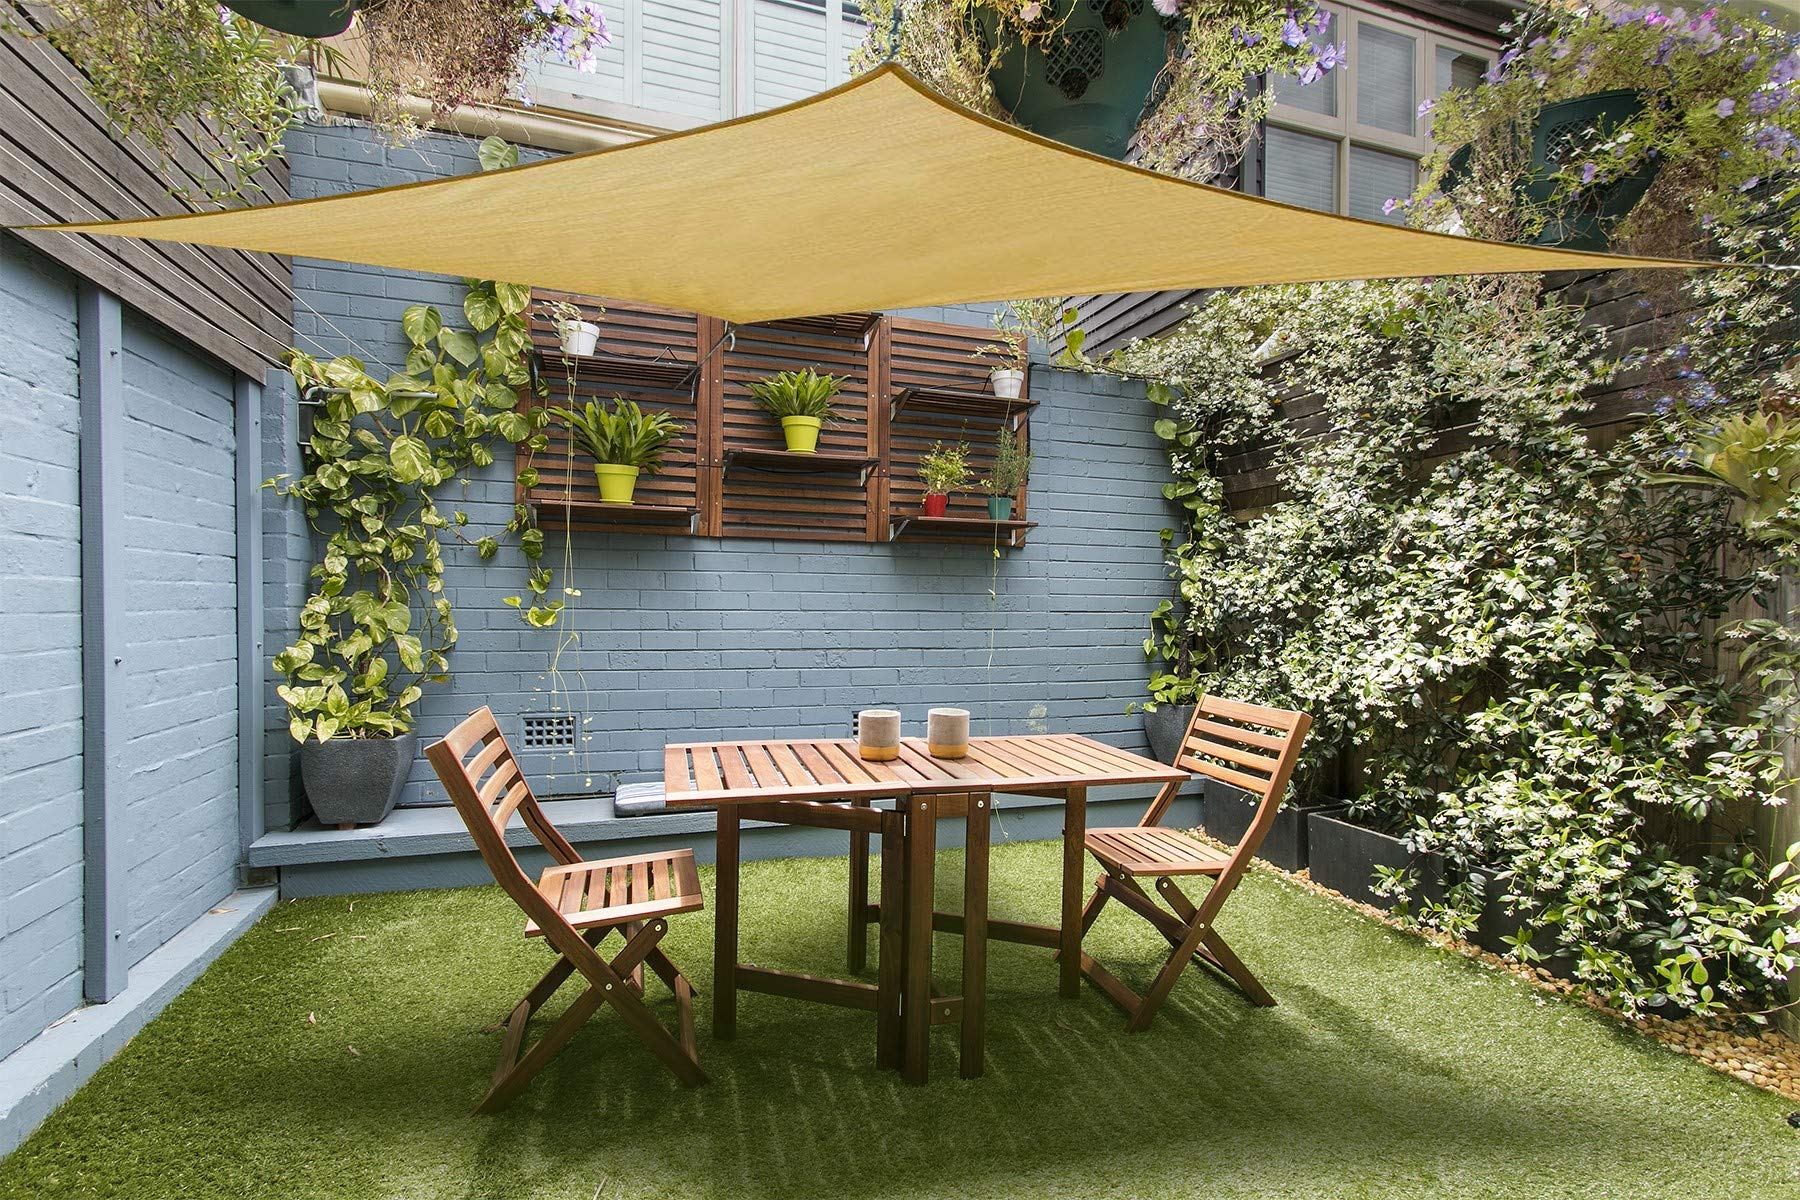 Cool Area Rectangle 9'10'' X 13' Sun Shade Sail, UV Block for Outdoor Patio Garden in Color Sand